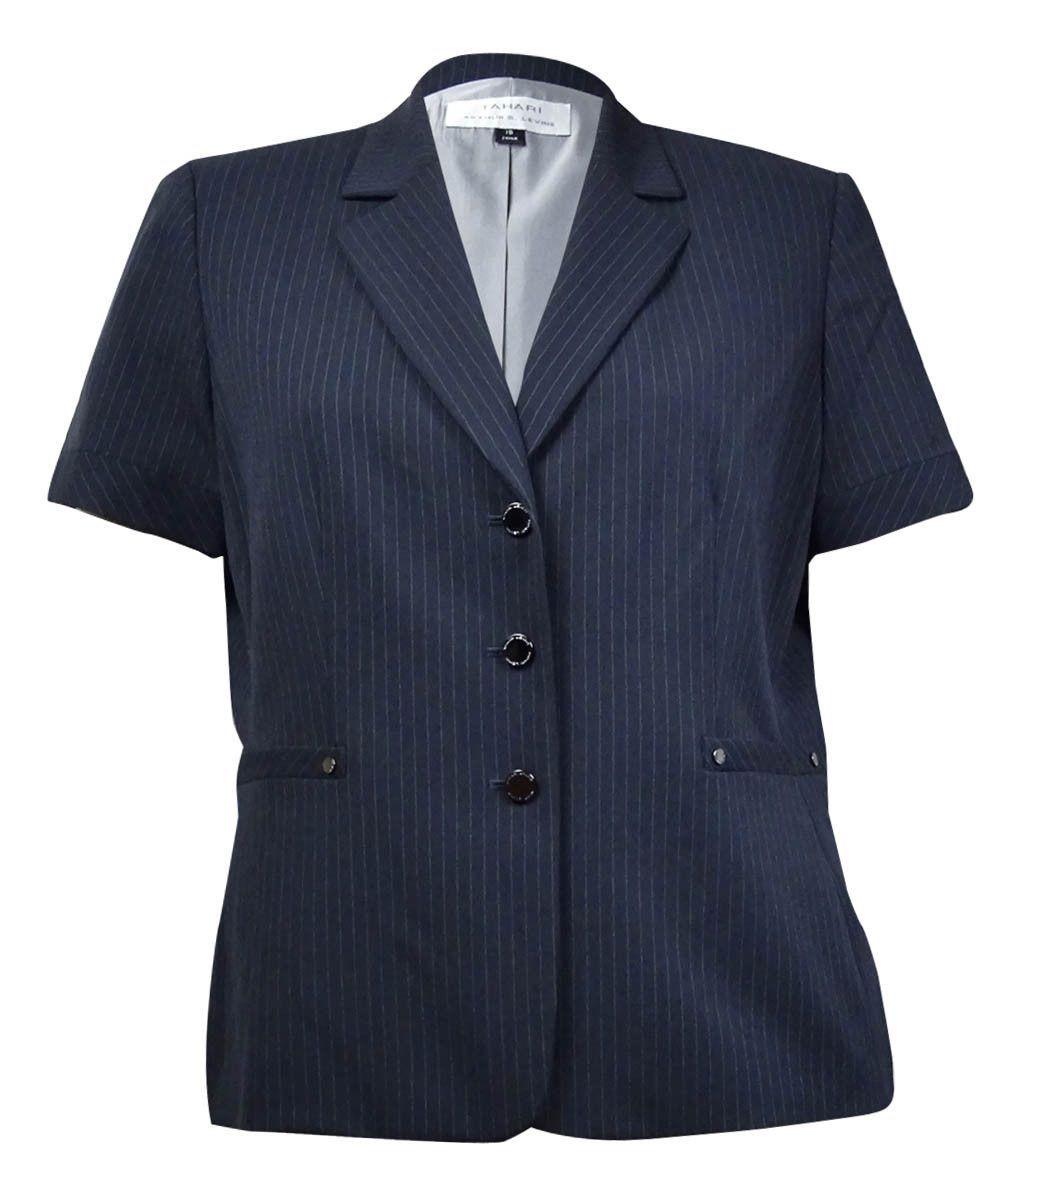 Tahari Women's Notch Pinstriped Short Sleeves Blazer